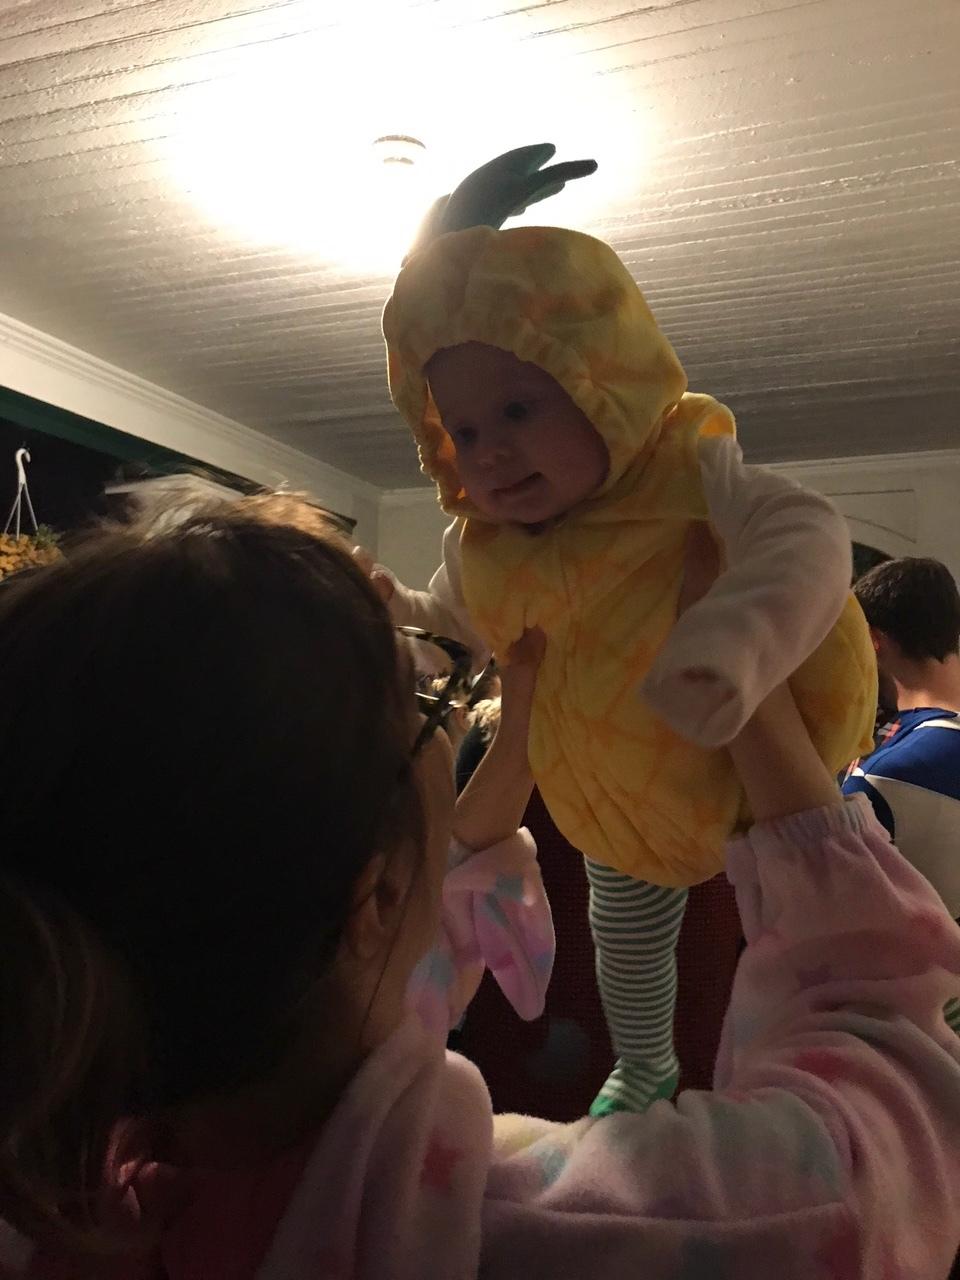 Baby Pineapple!